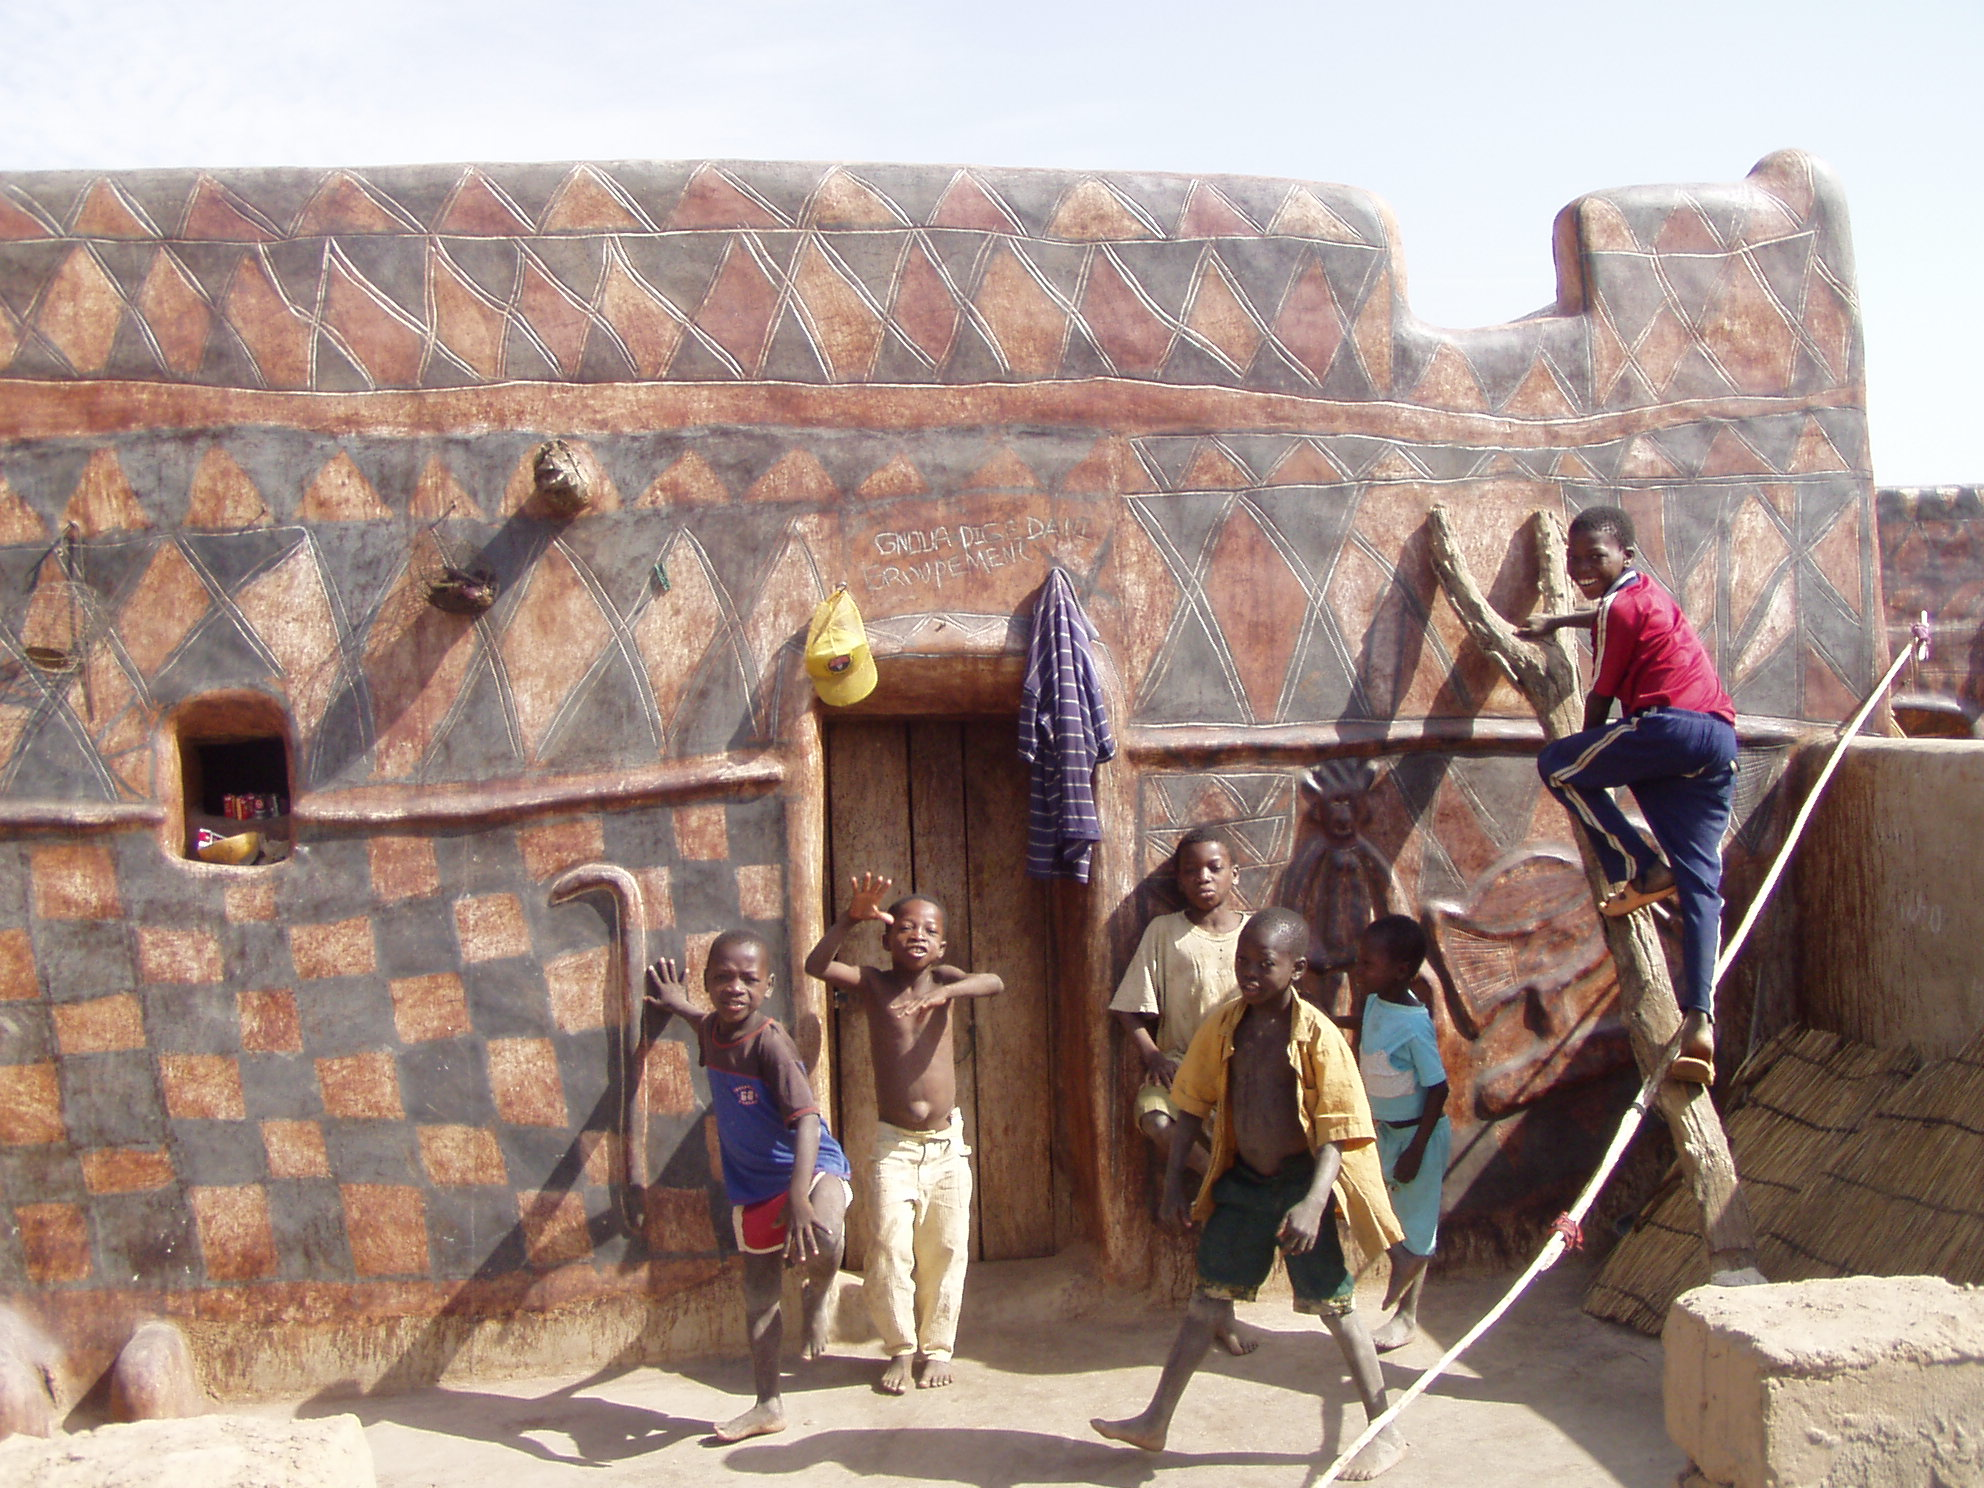 Enfants et maison kassena. Children and kassena house.